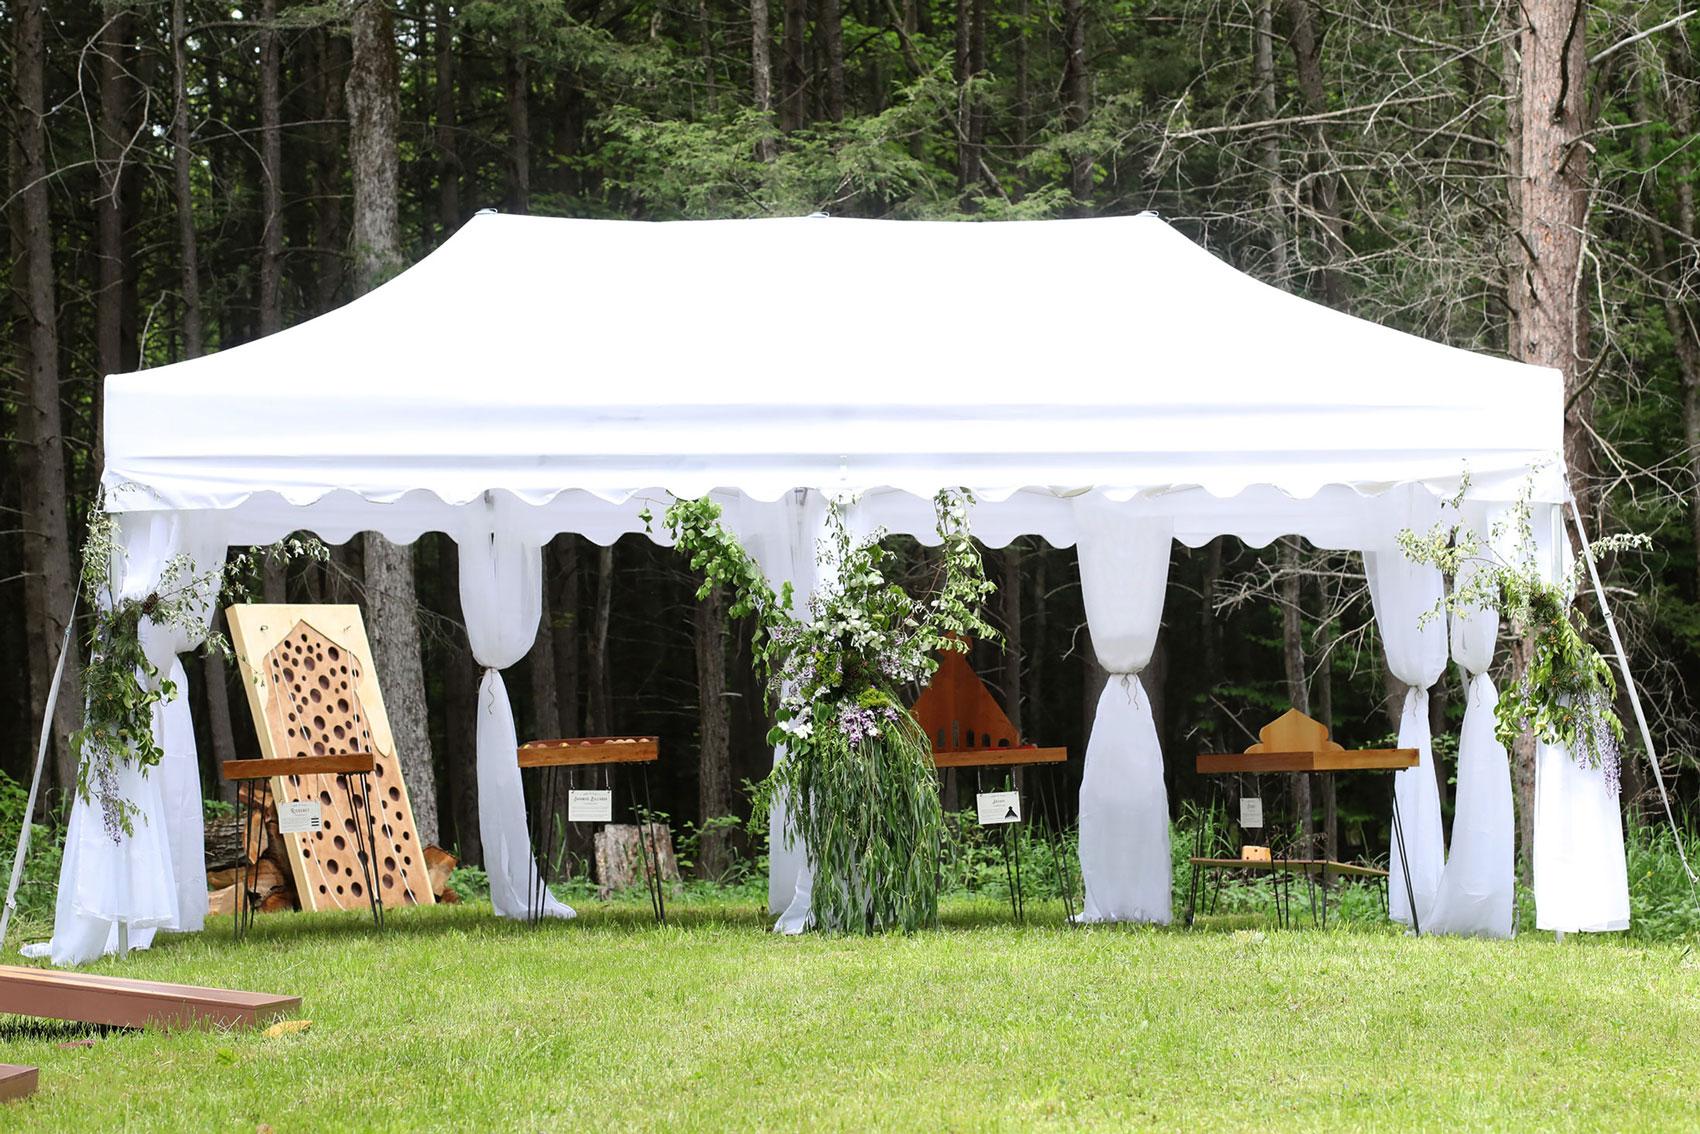 Upstate-Jamboree-Hudson-Valley-NYC-Wedding-Games-for-Hire-Rentals-Vendor-New-York-32.jpg